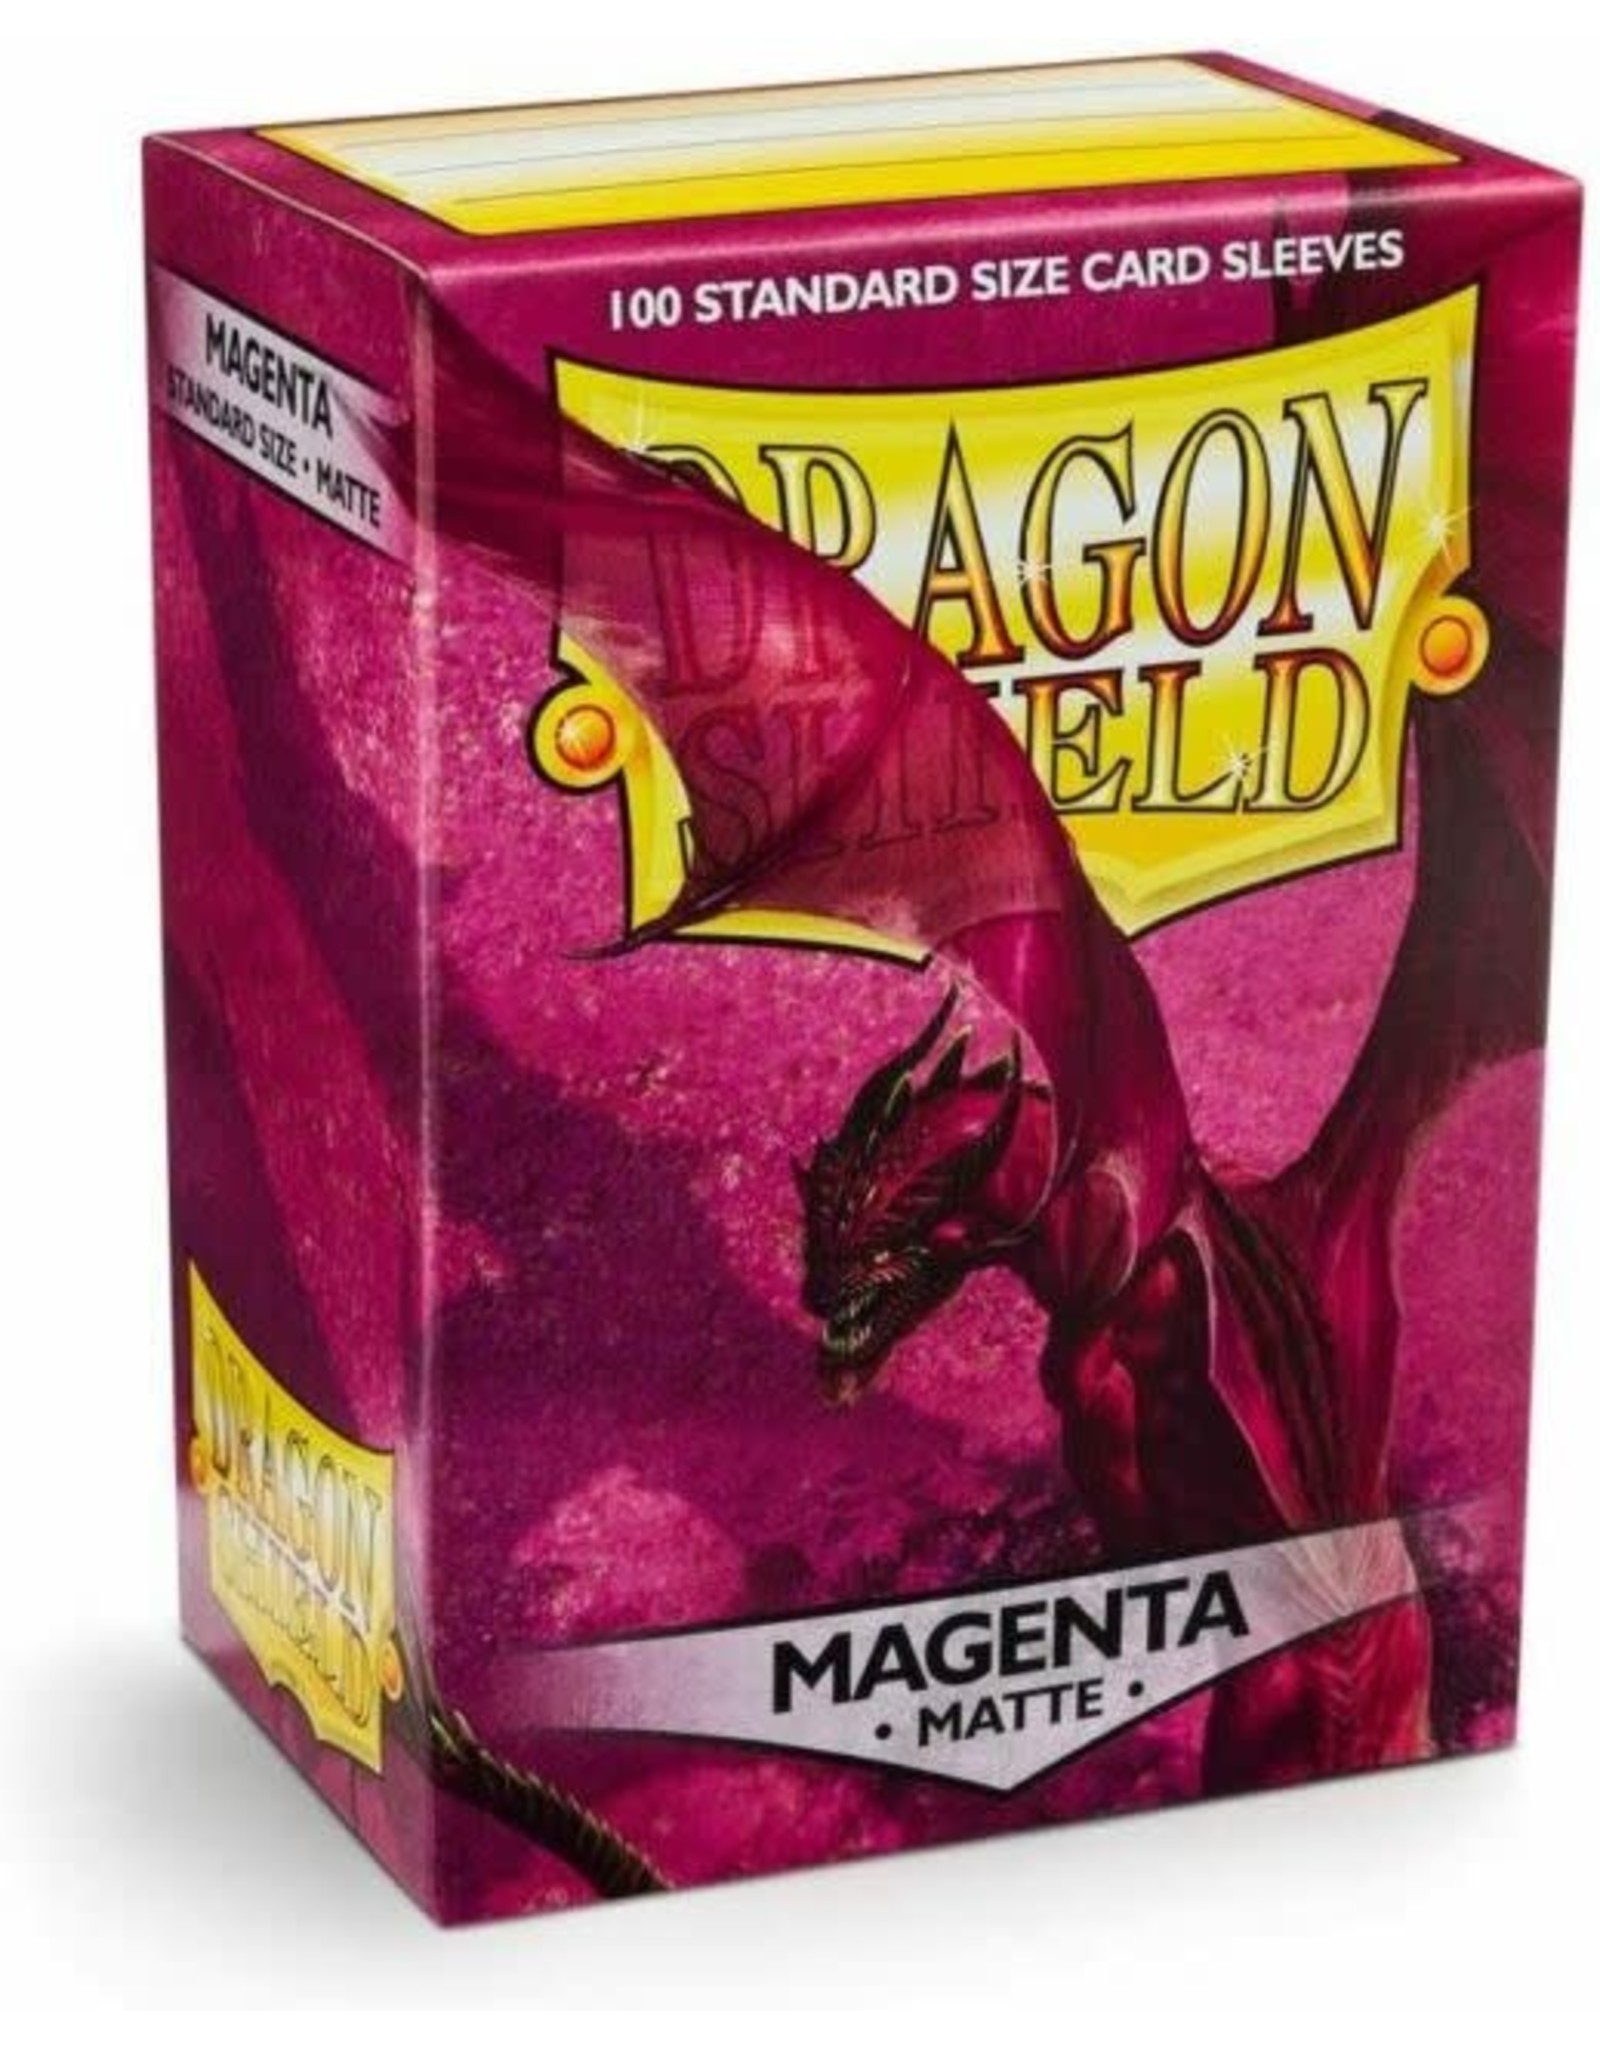 Arcane Tinmen Dragon Shield Magenta Matte 100 Standard